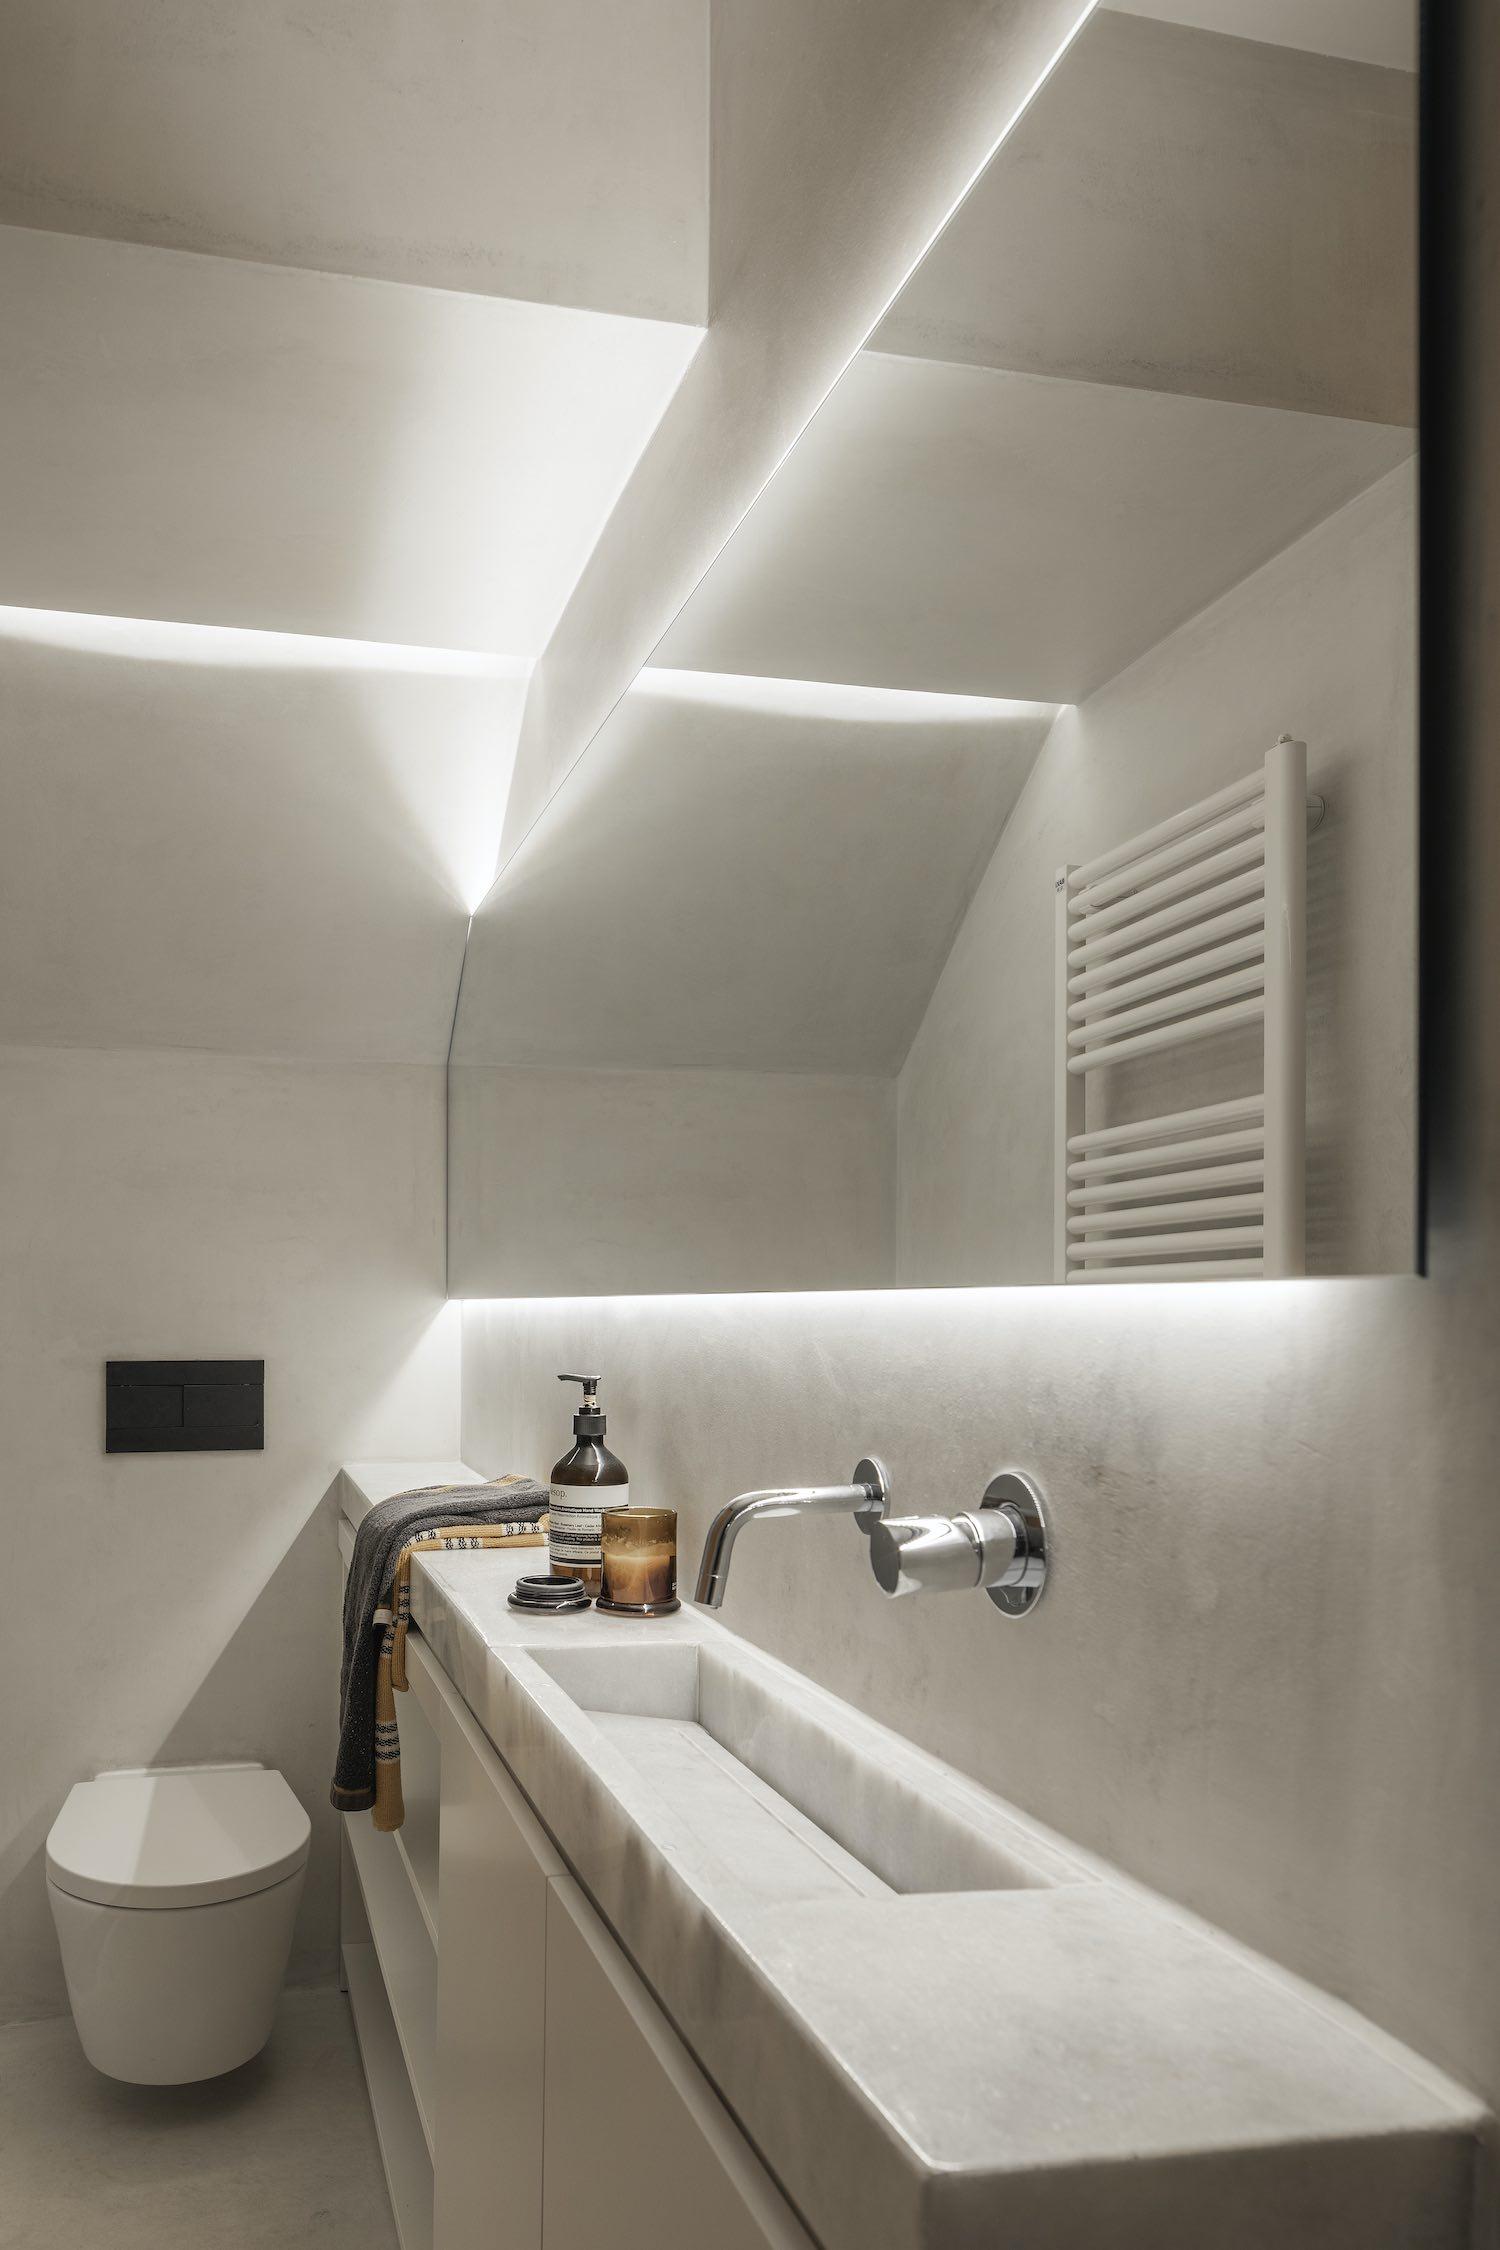 ceramic washing basin and towels